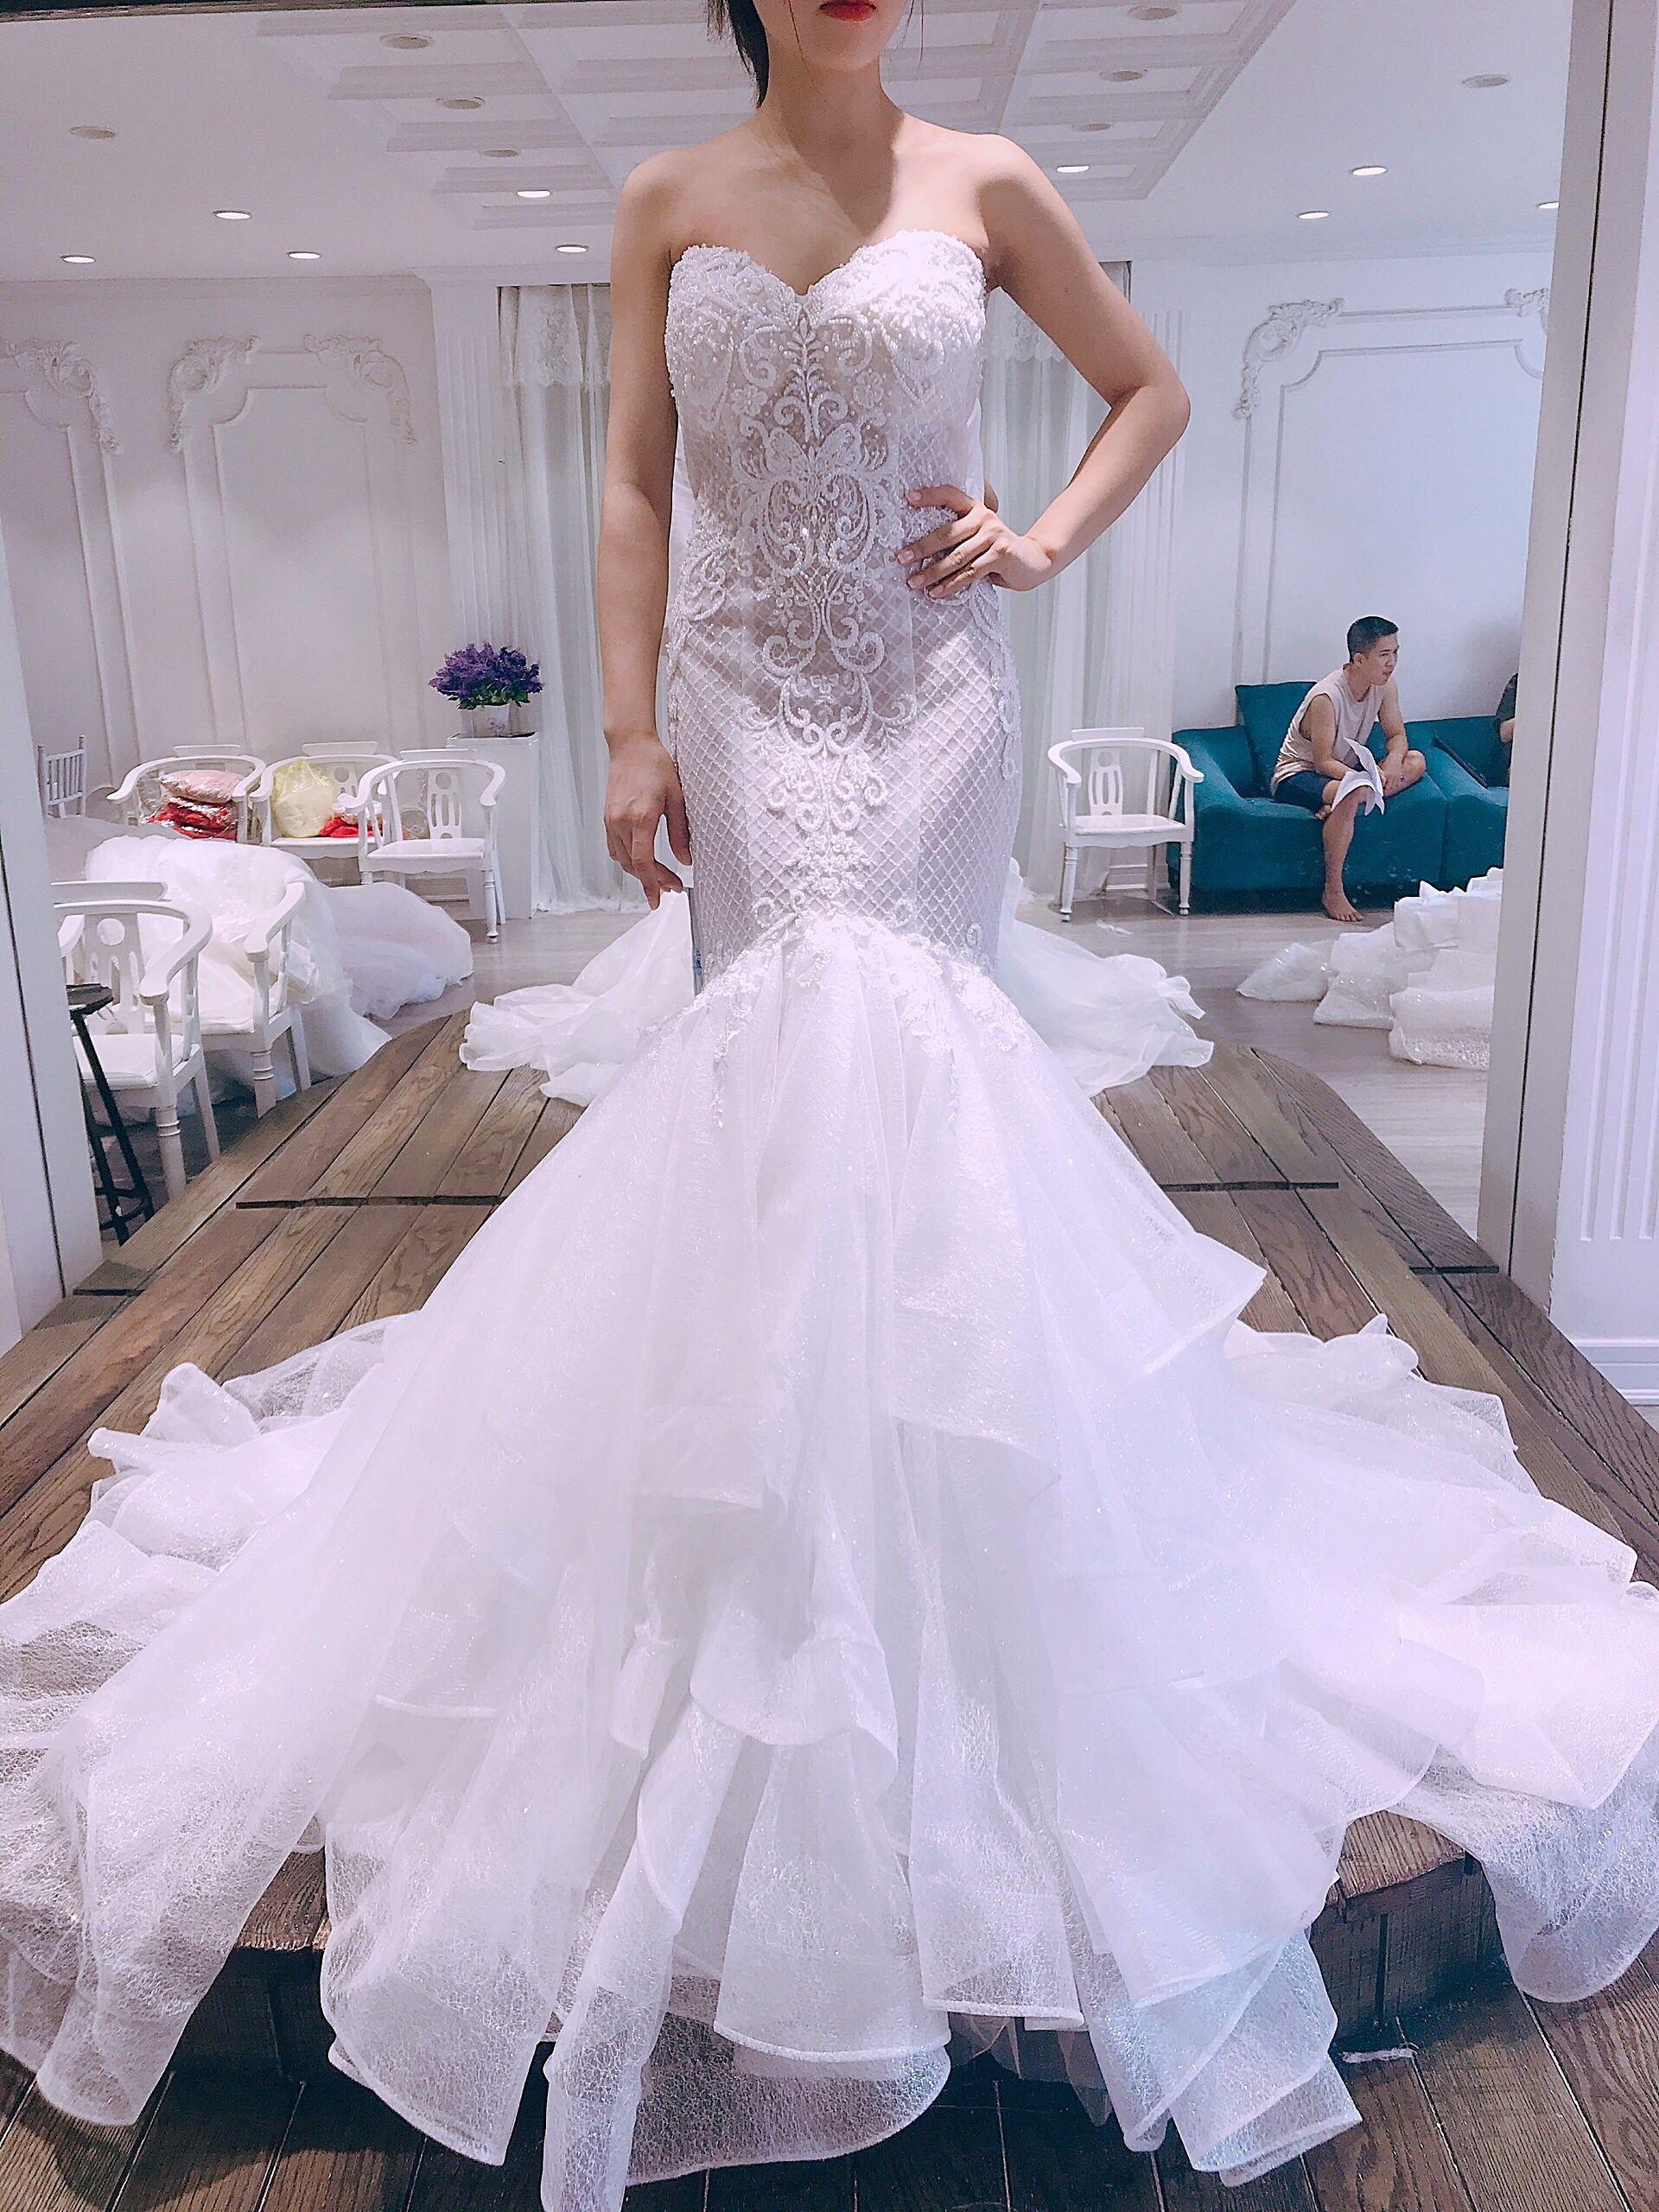 Mermaid Wedding Dress With Overskirt Etsy Wedding Dresses Online Wedding Dress Dresses [ 2560 x 1920 Pixel ]